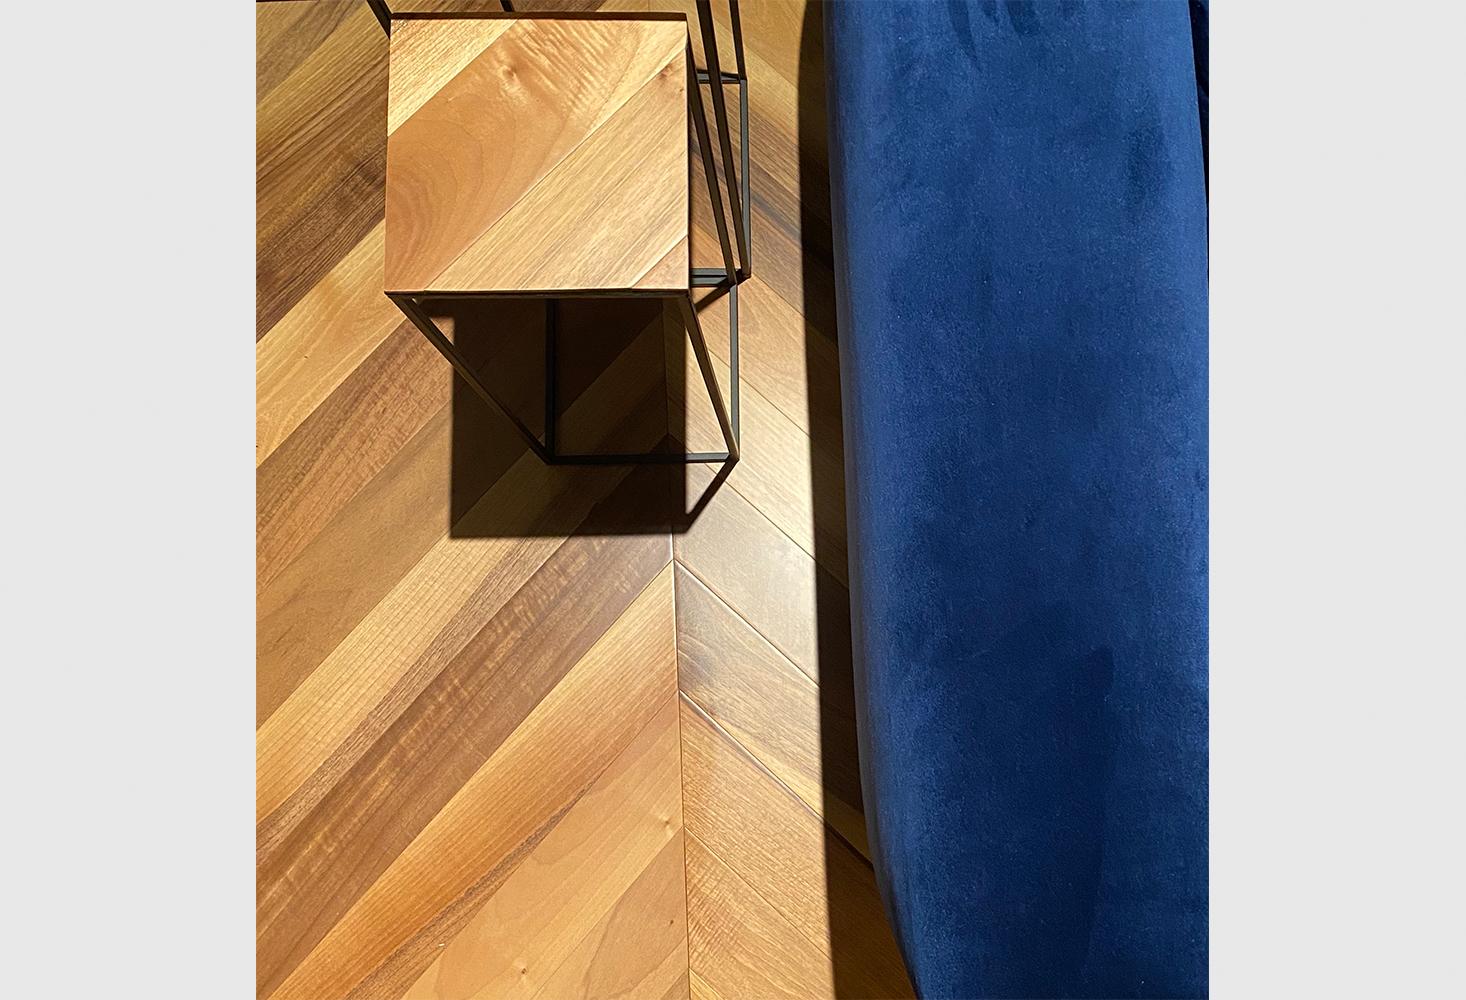 parquet Spina Ungherese 45° European Walnut Natur, brushed varnished